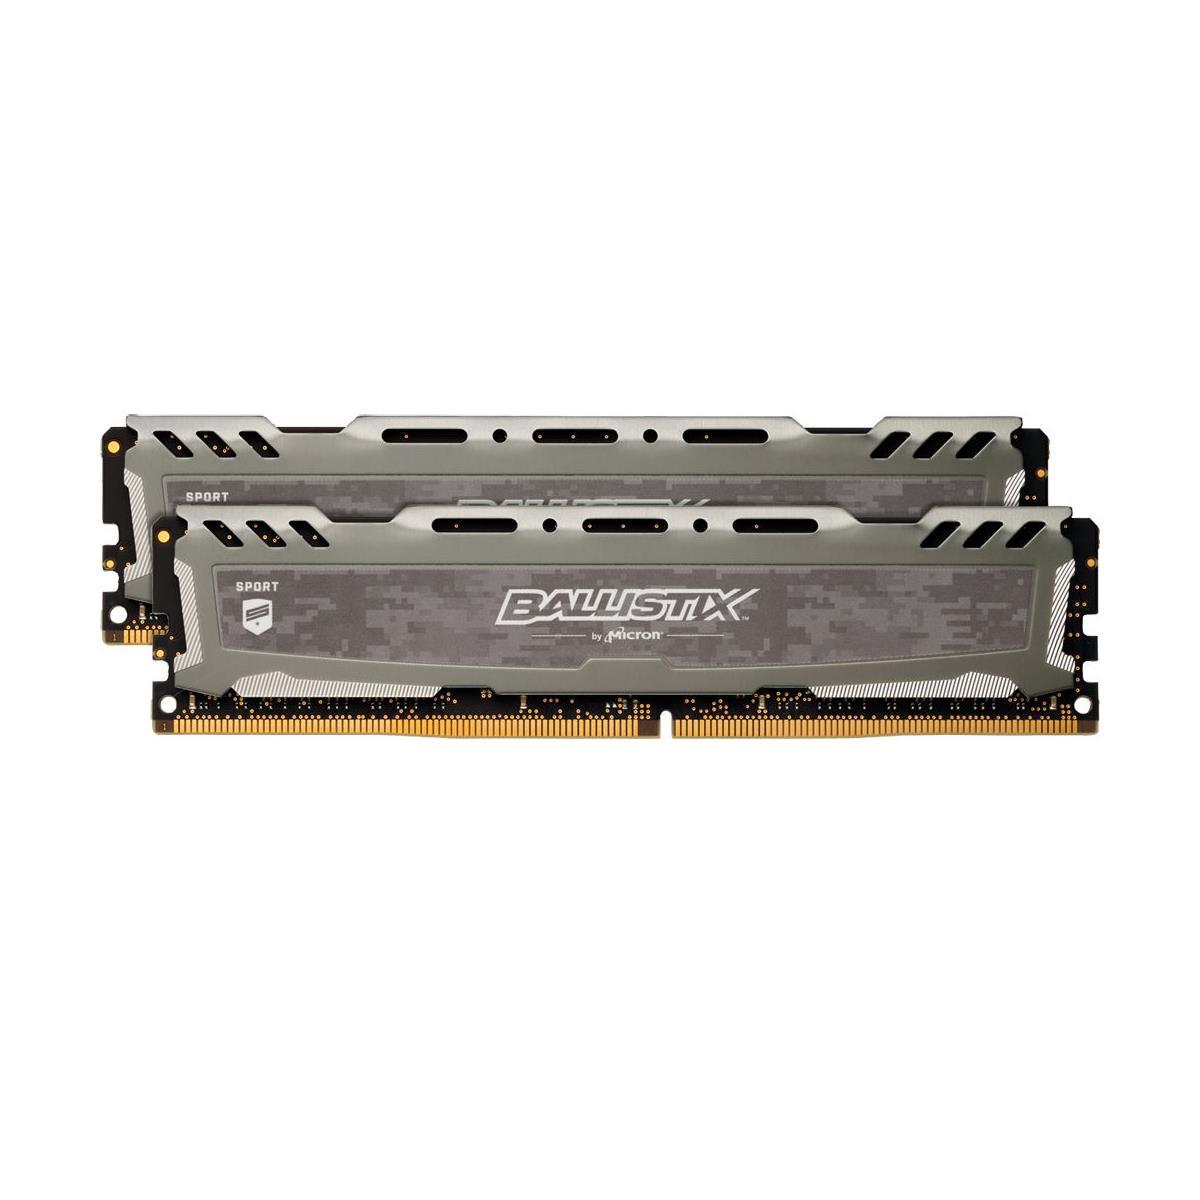 Crucial Technology 32GB (2x 16GB) 288-Pin EUDIMM DDR4 (PC4-19200) Module Kit CT2K16G4XFD824A $259.99